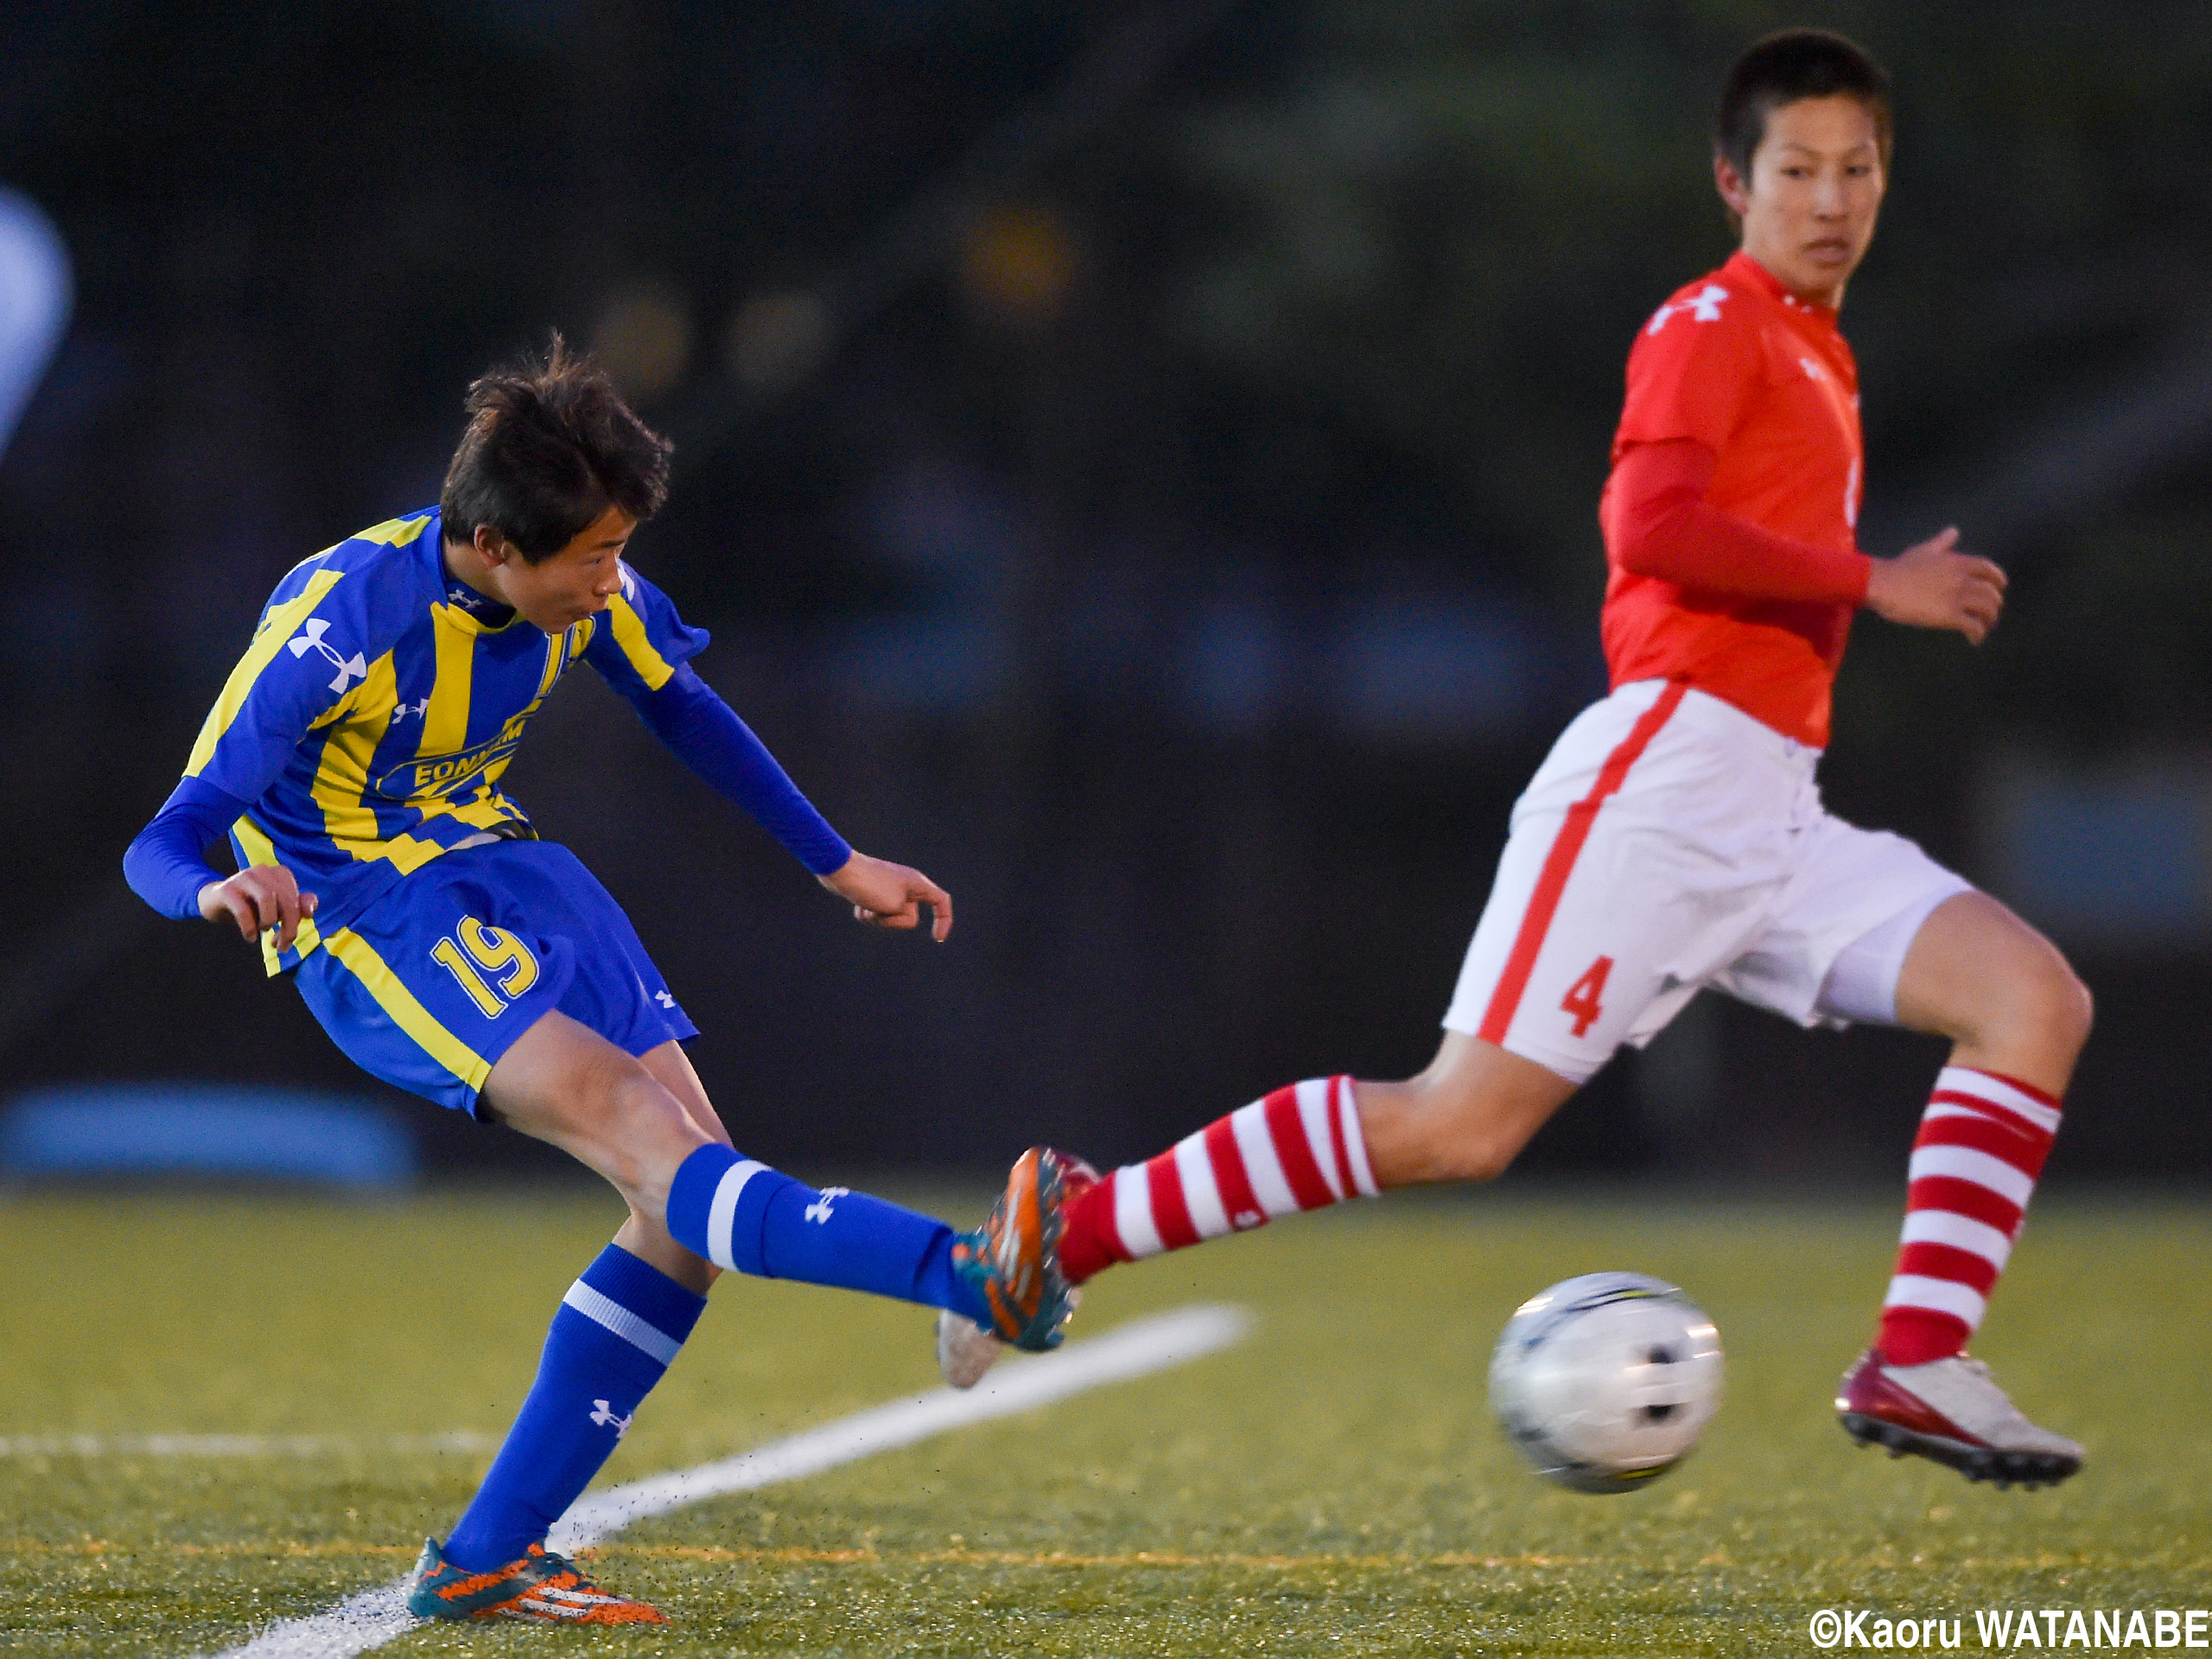 [UAチャレンジカップ]韓国王者・彦南が名門・秋田商に4ゴールで攻め勝つ(16枚)